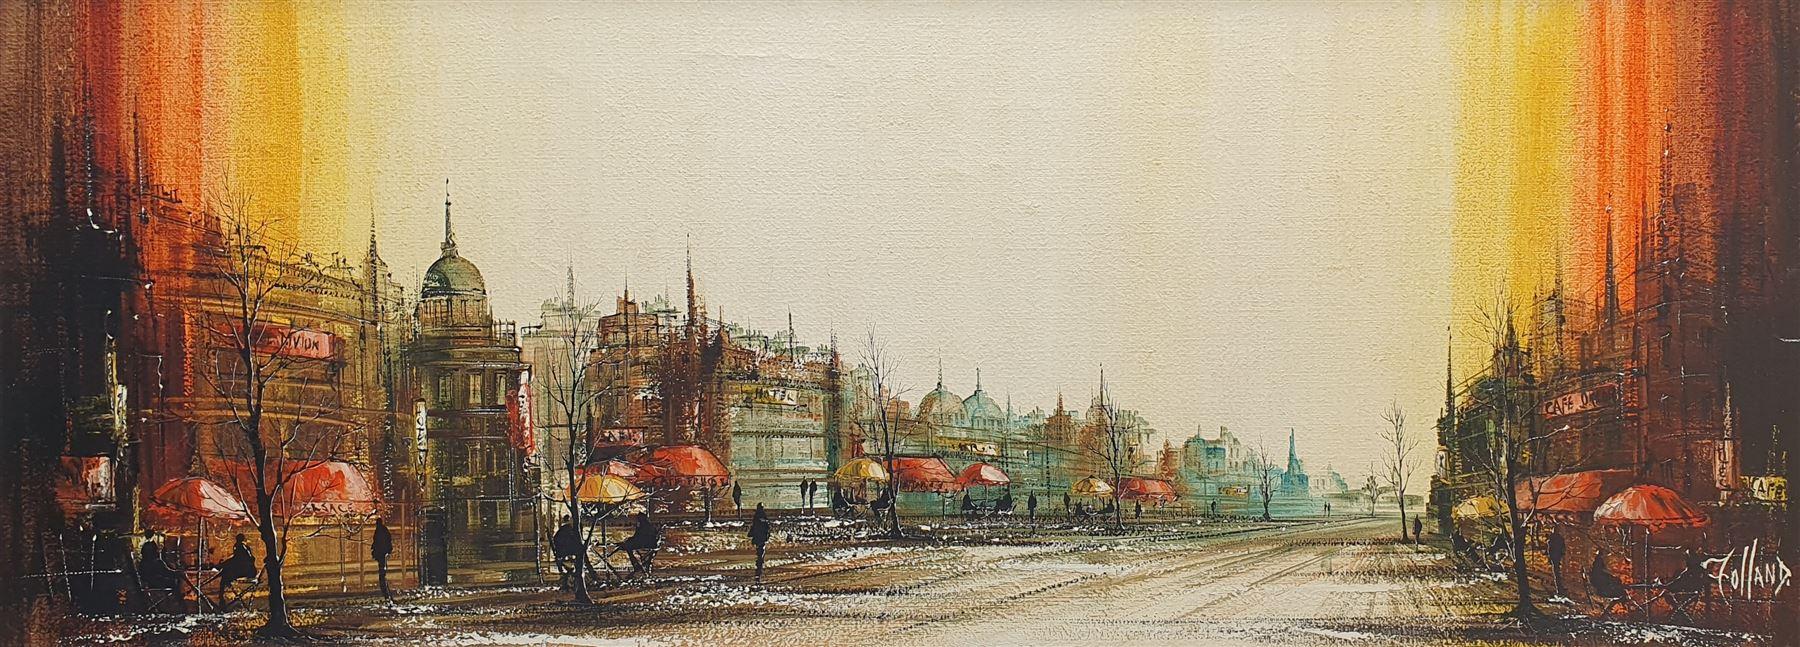 Ronald Norman Folland (British 1932-1999): Parisian Street